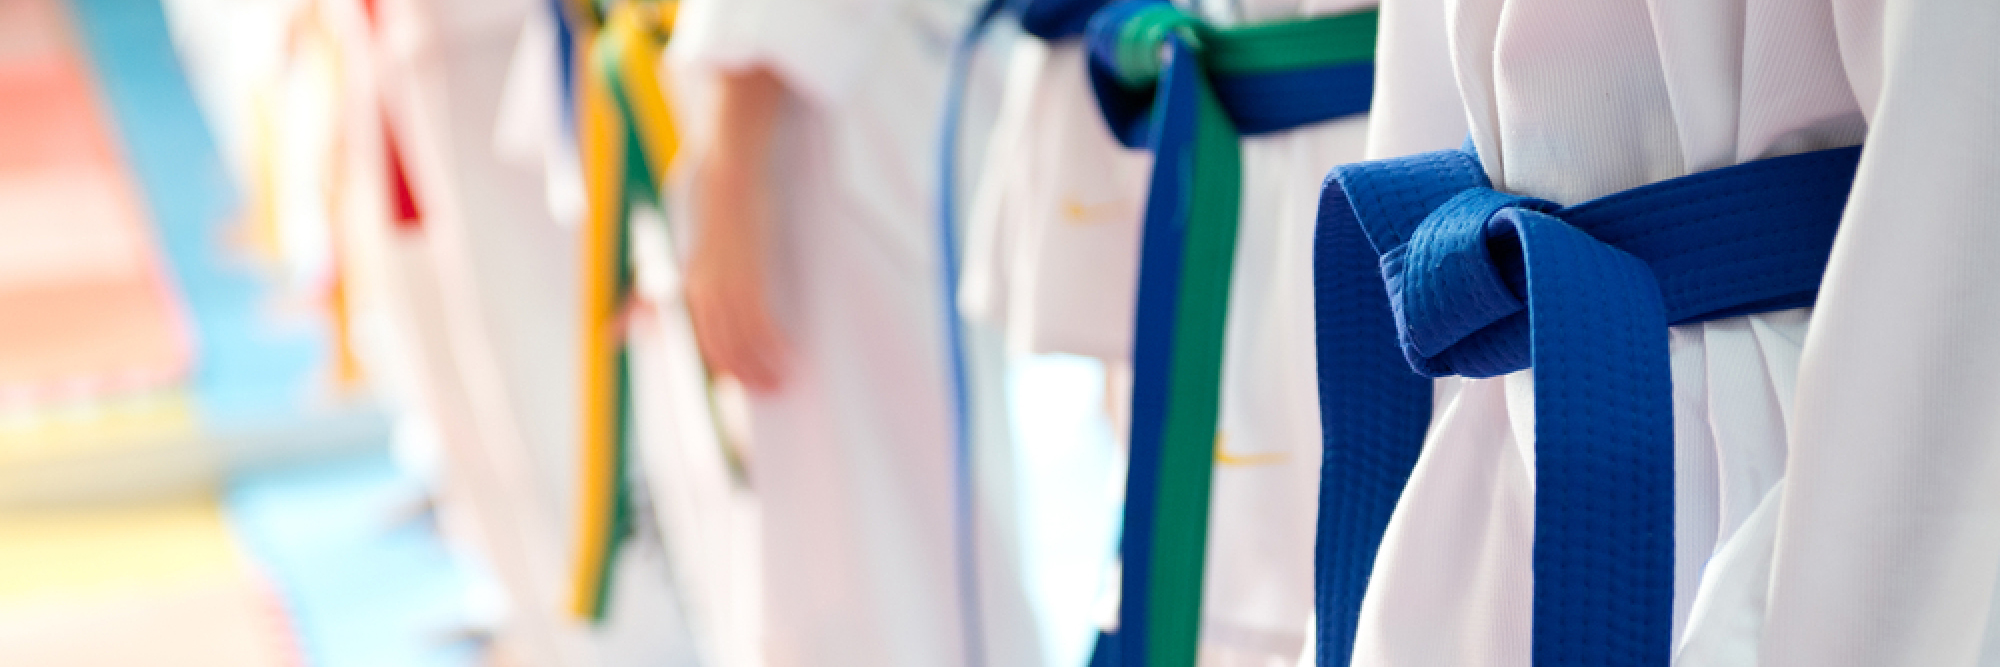 Taekwondo - Kinder Selbstverteidigung